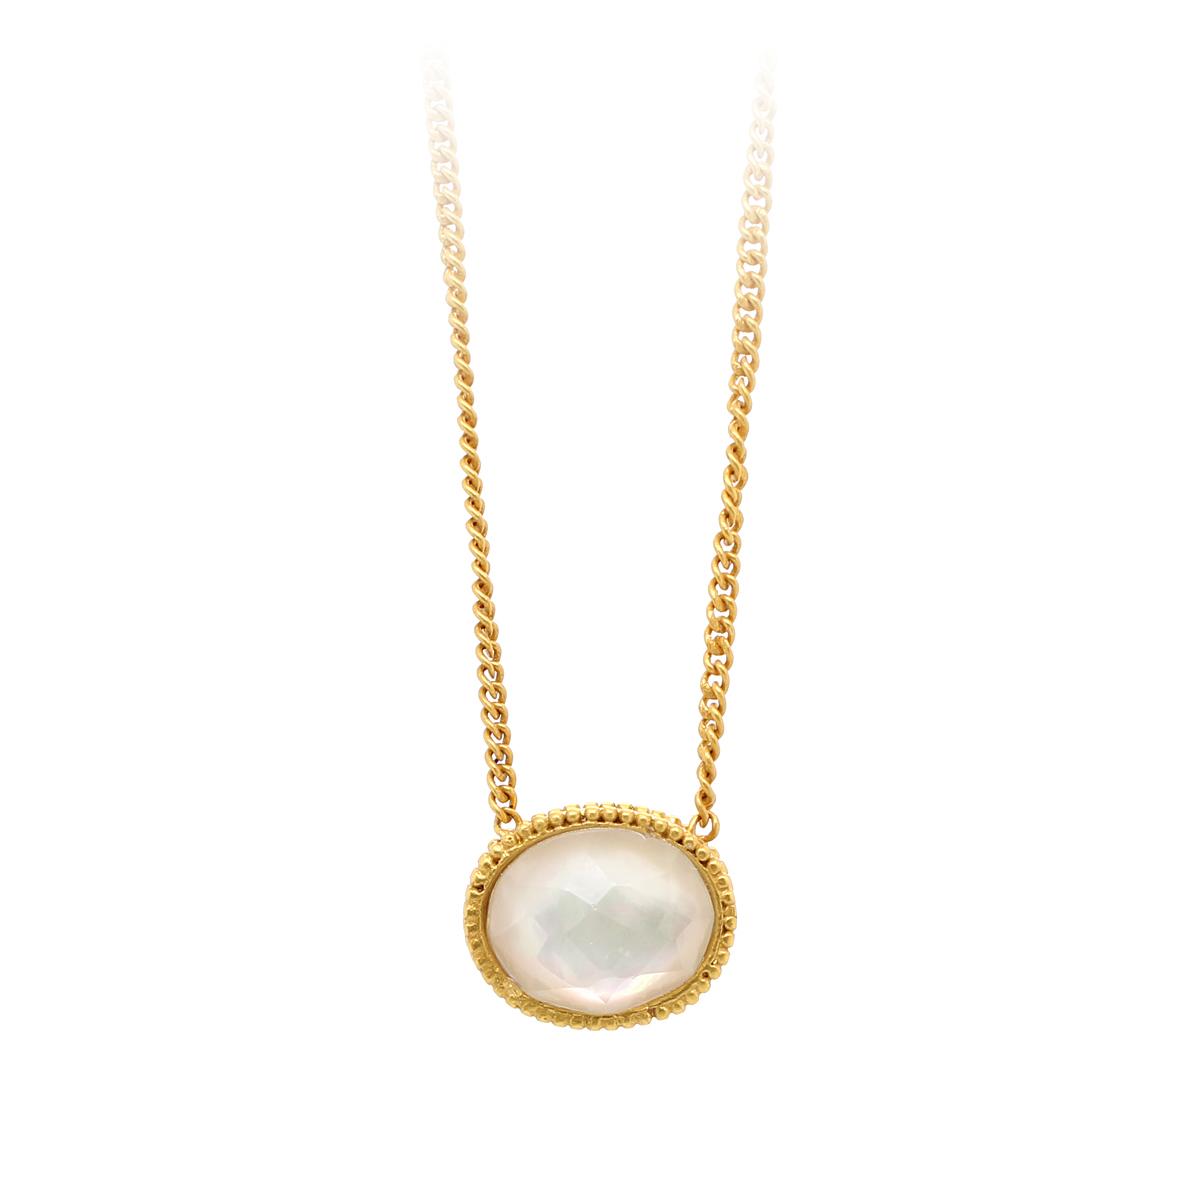 Julie Vos 24 Karat Gold Plated Verona Iridescent Crystal Solitaire Necklace